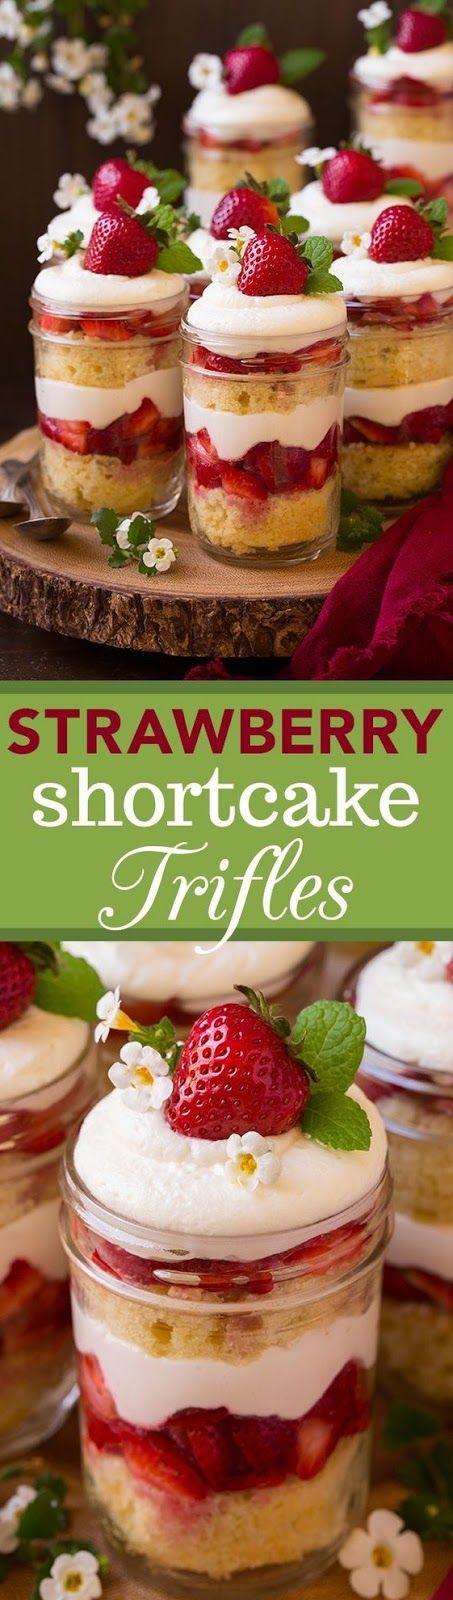 Strawberry Shortcake Trifles desserts Trifle recipe